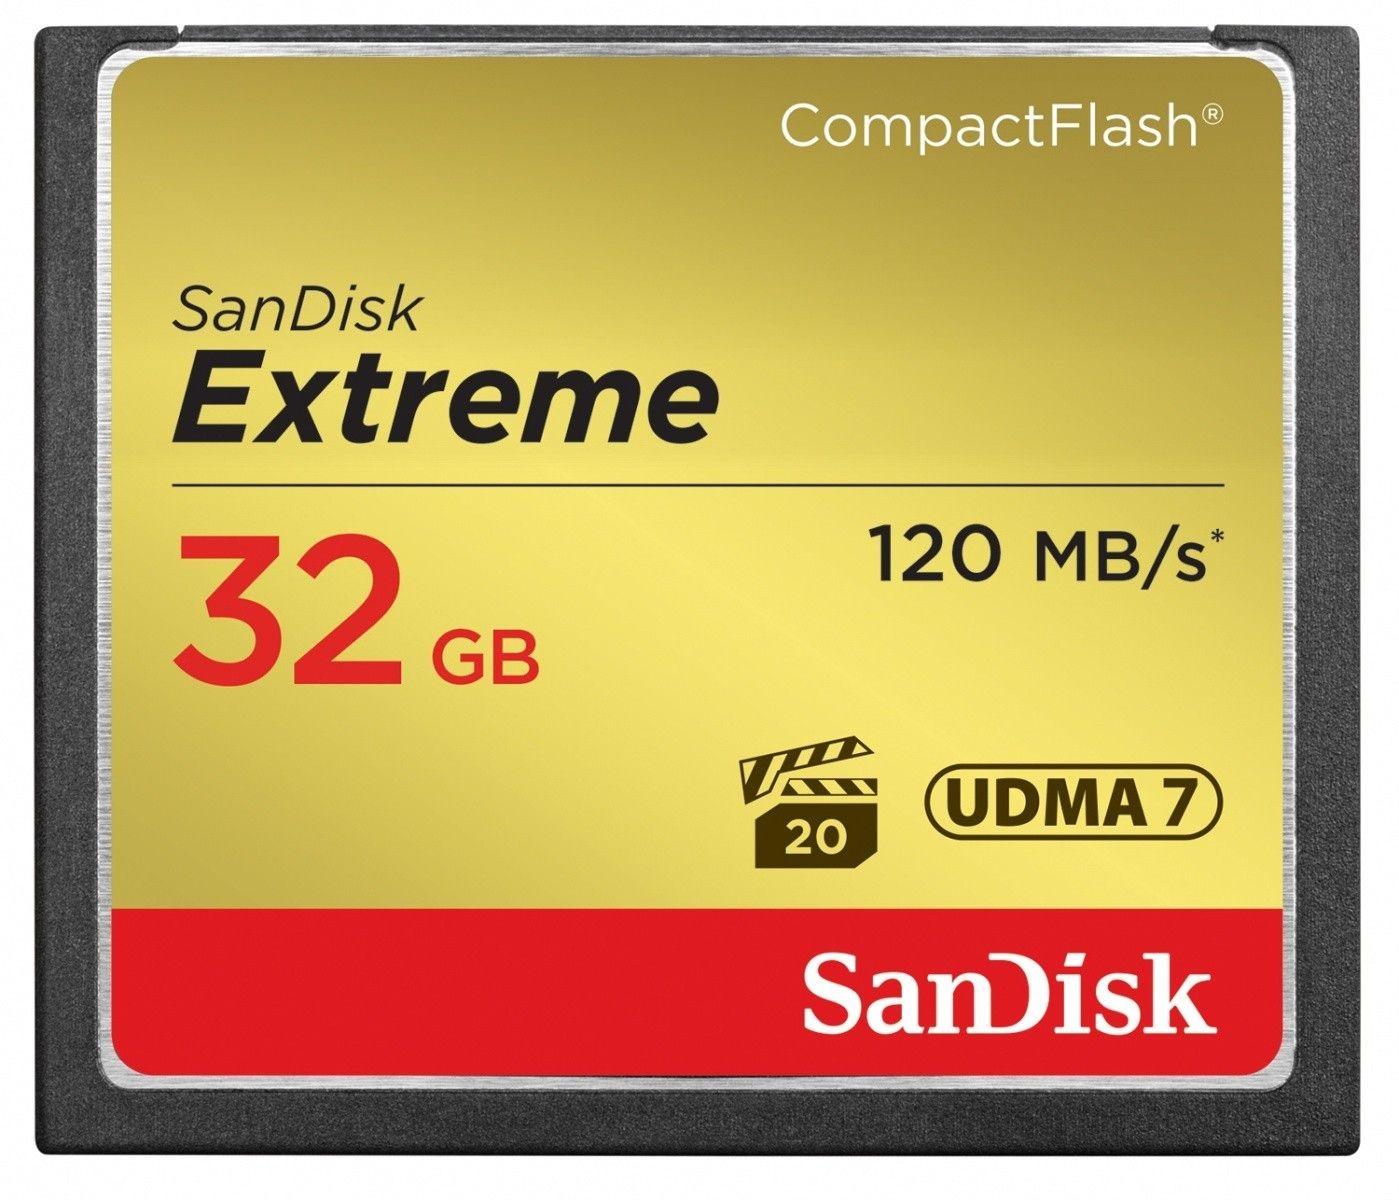 SanDisk karta Compact Flash Extreme 32GB UDMA7 (transfer 120MB/s)